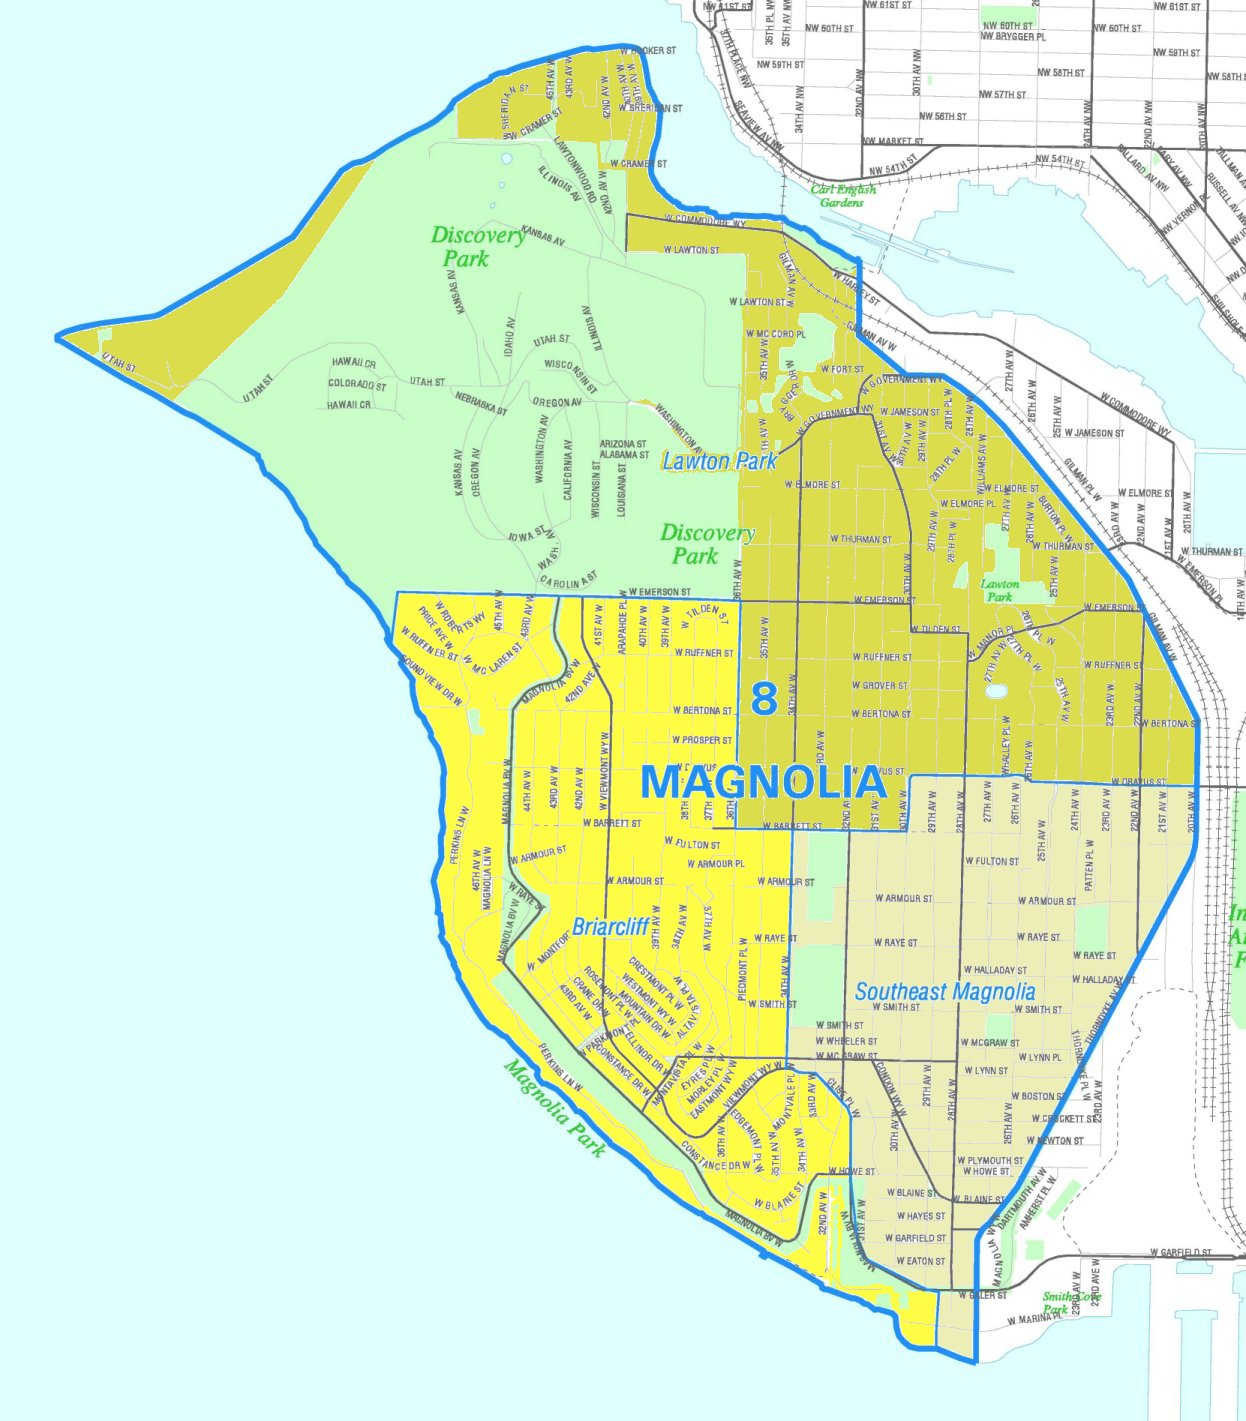 FileSeattle  Magnolia mapjpg  Wikimedia Commons